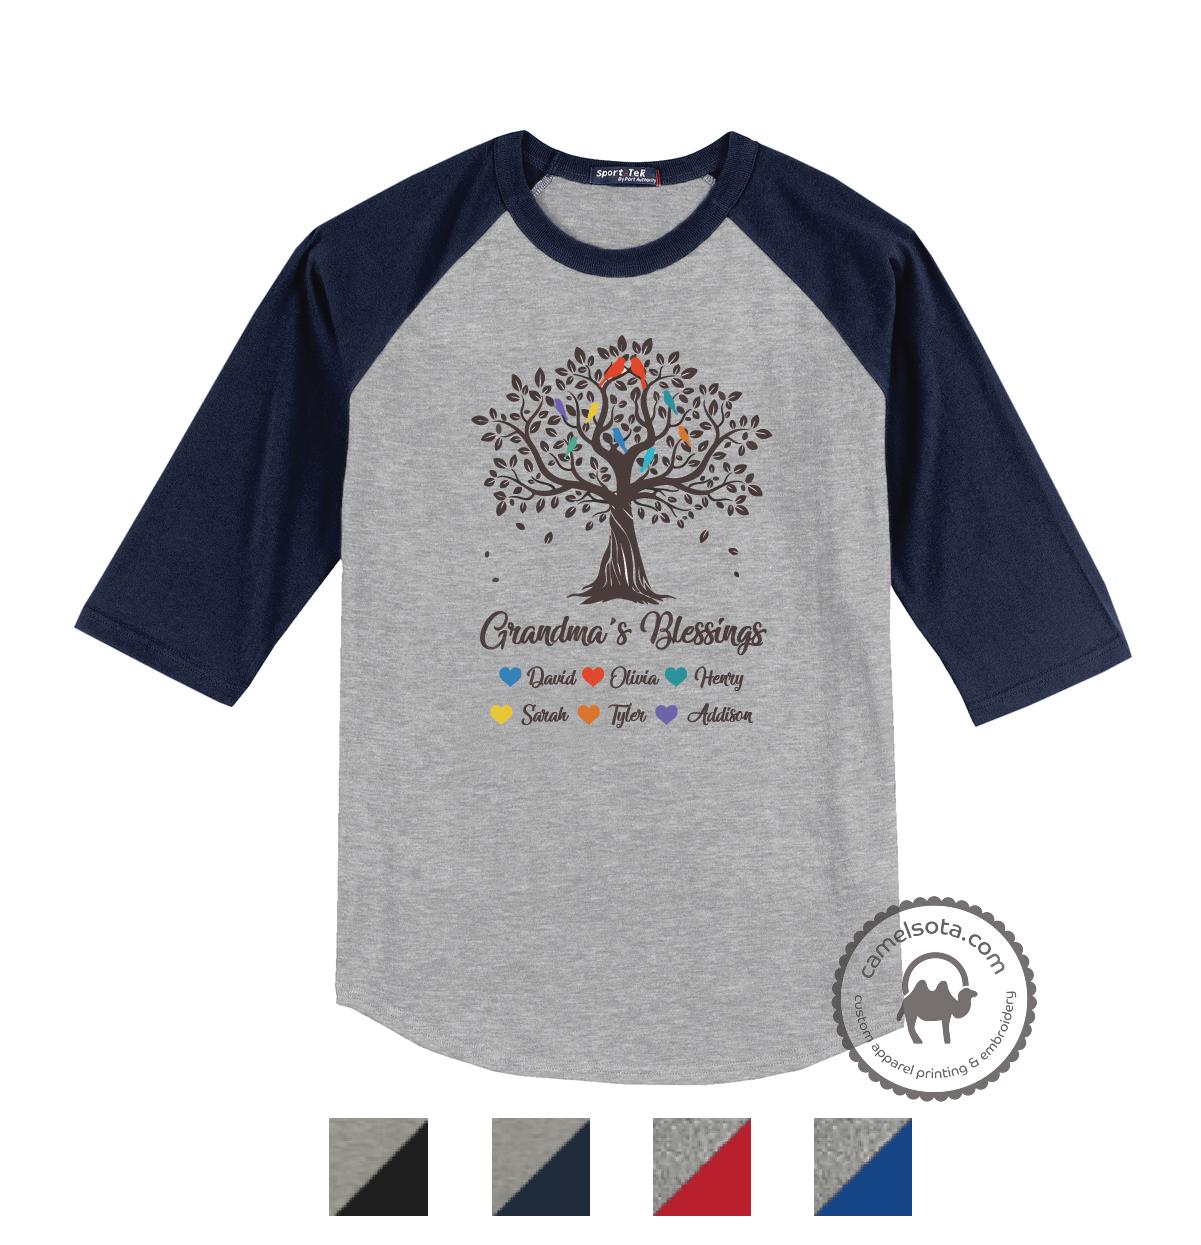 Grandma Tree Blessings Shirts with Grandkids Names - Light Grey